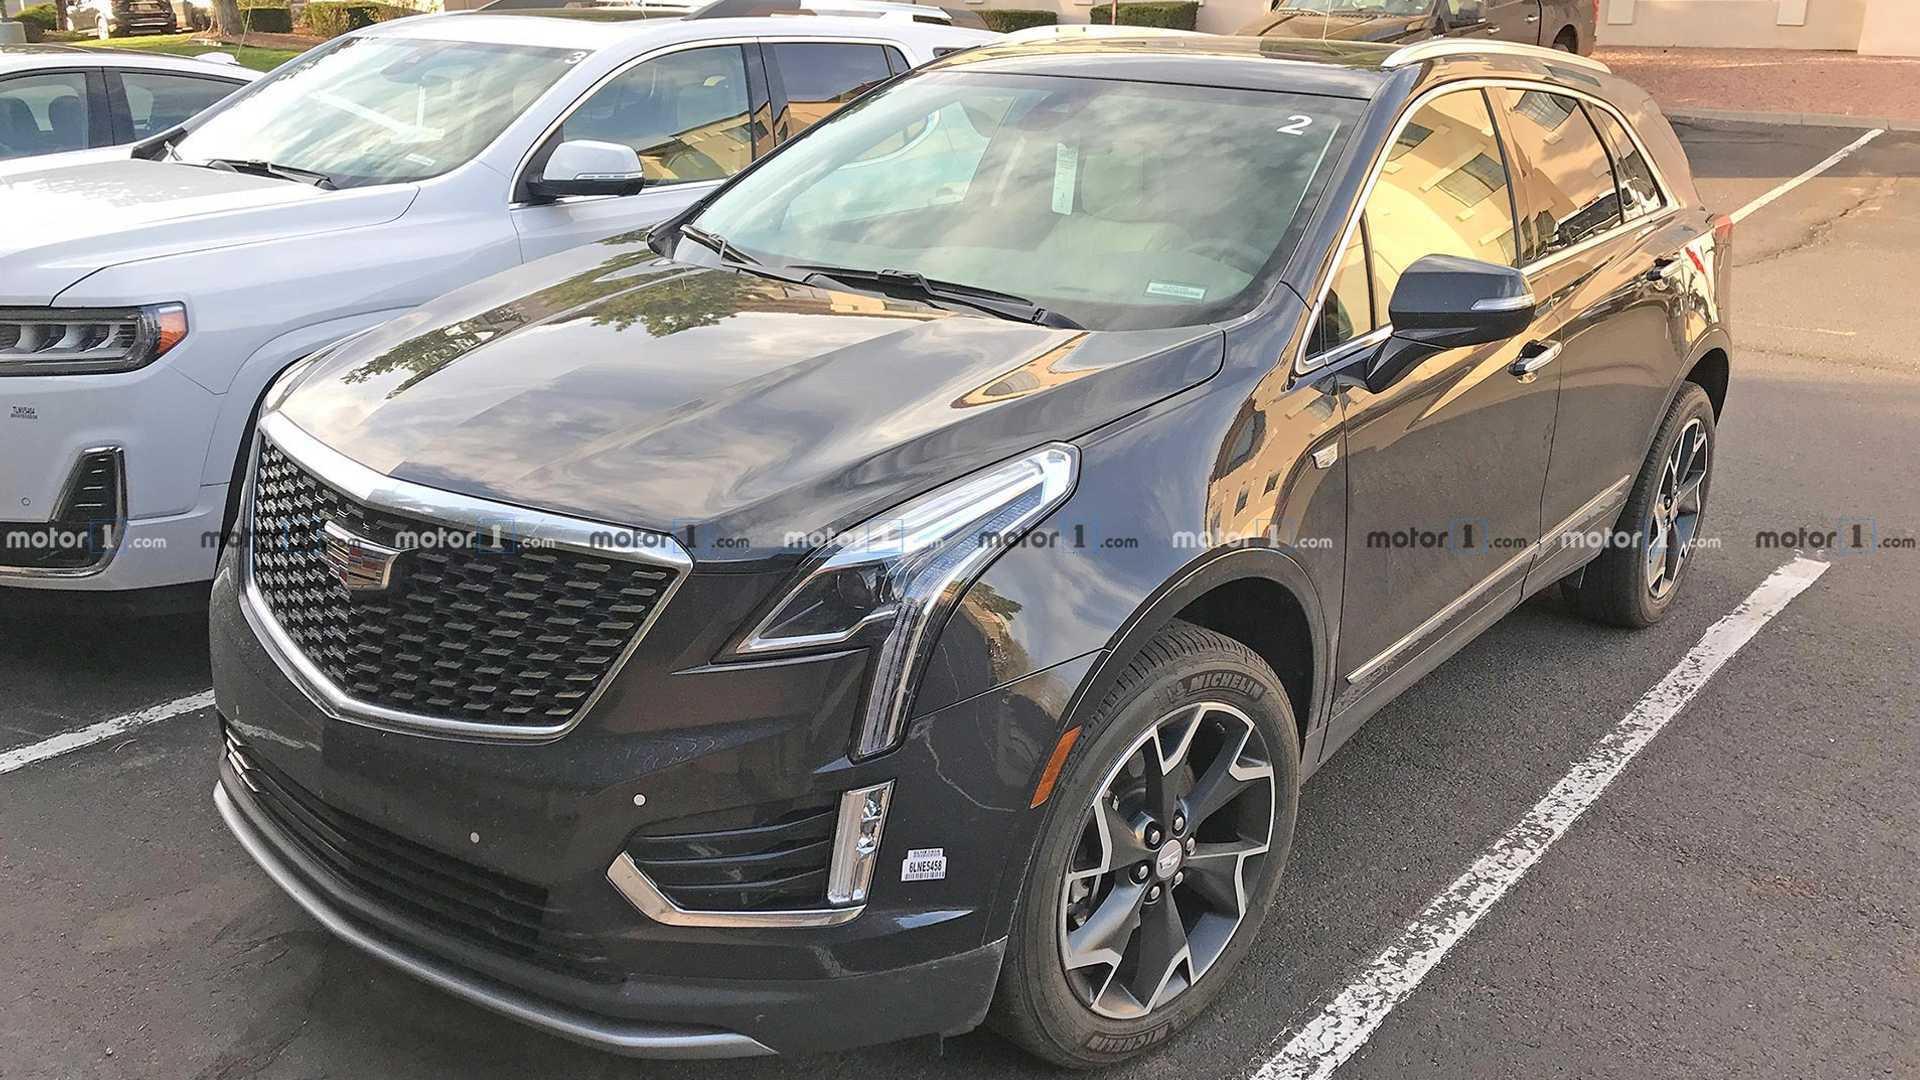 2020 Spy Shots Cadillac Xt5 First Drive